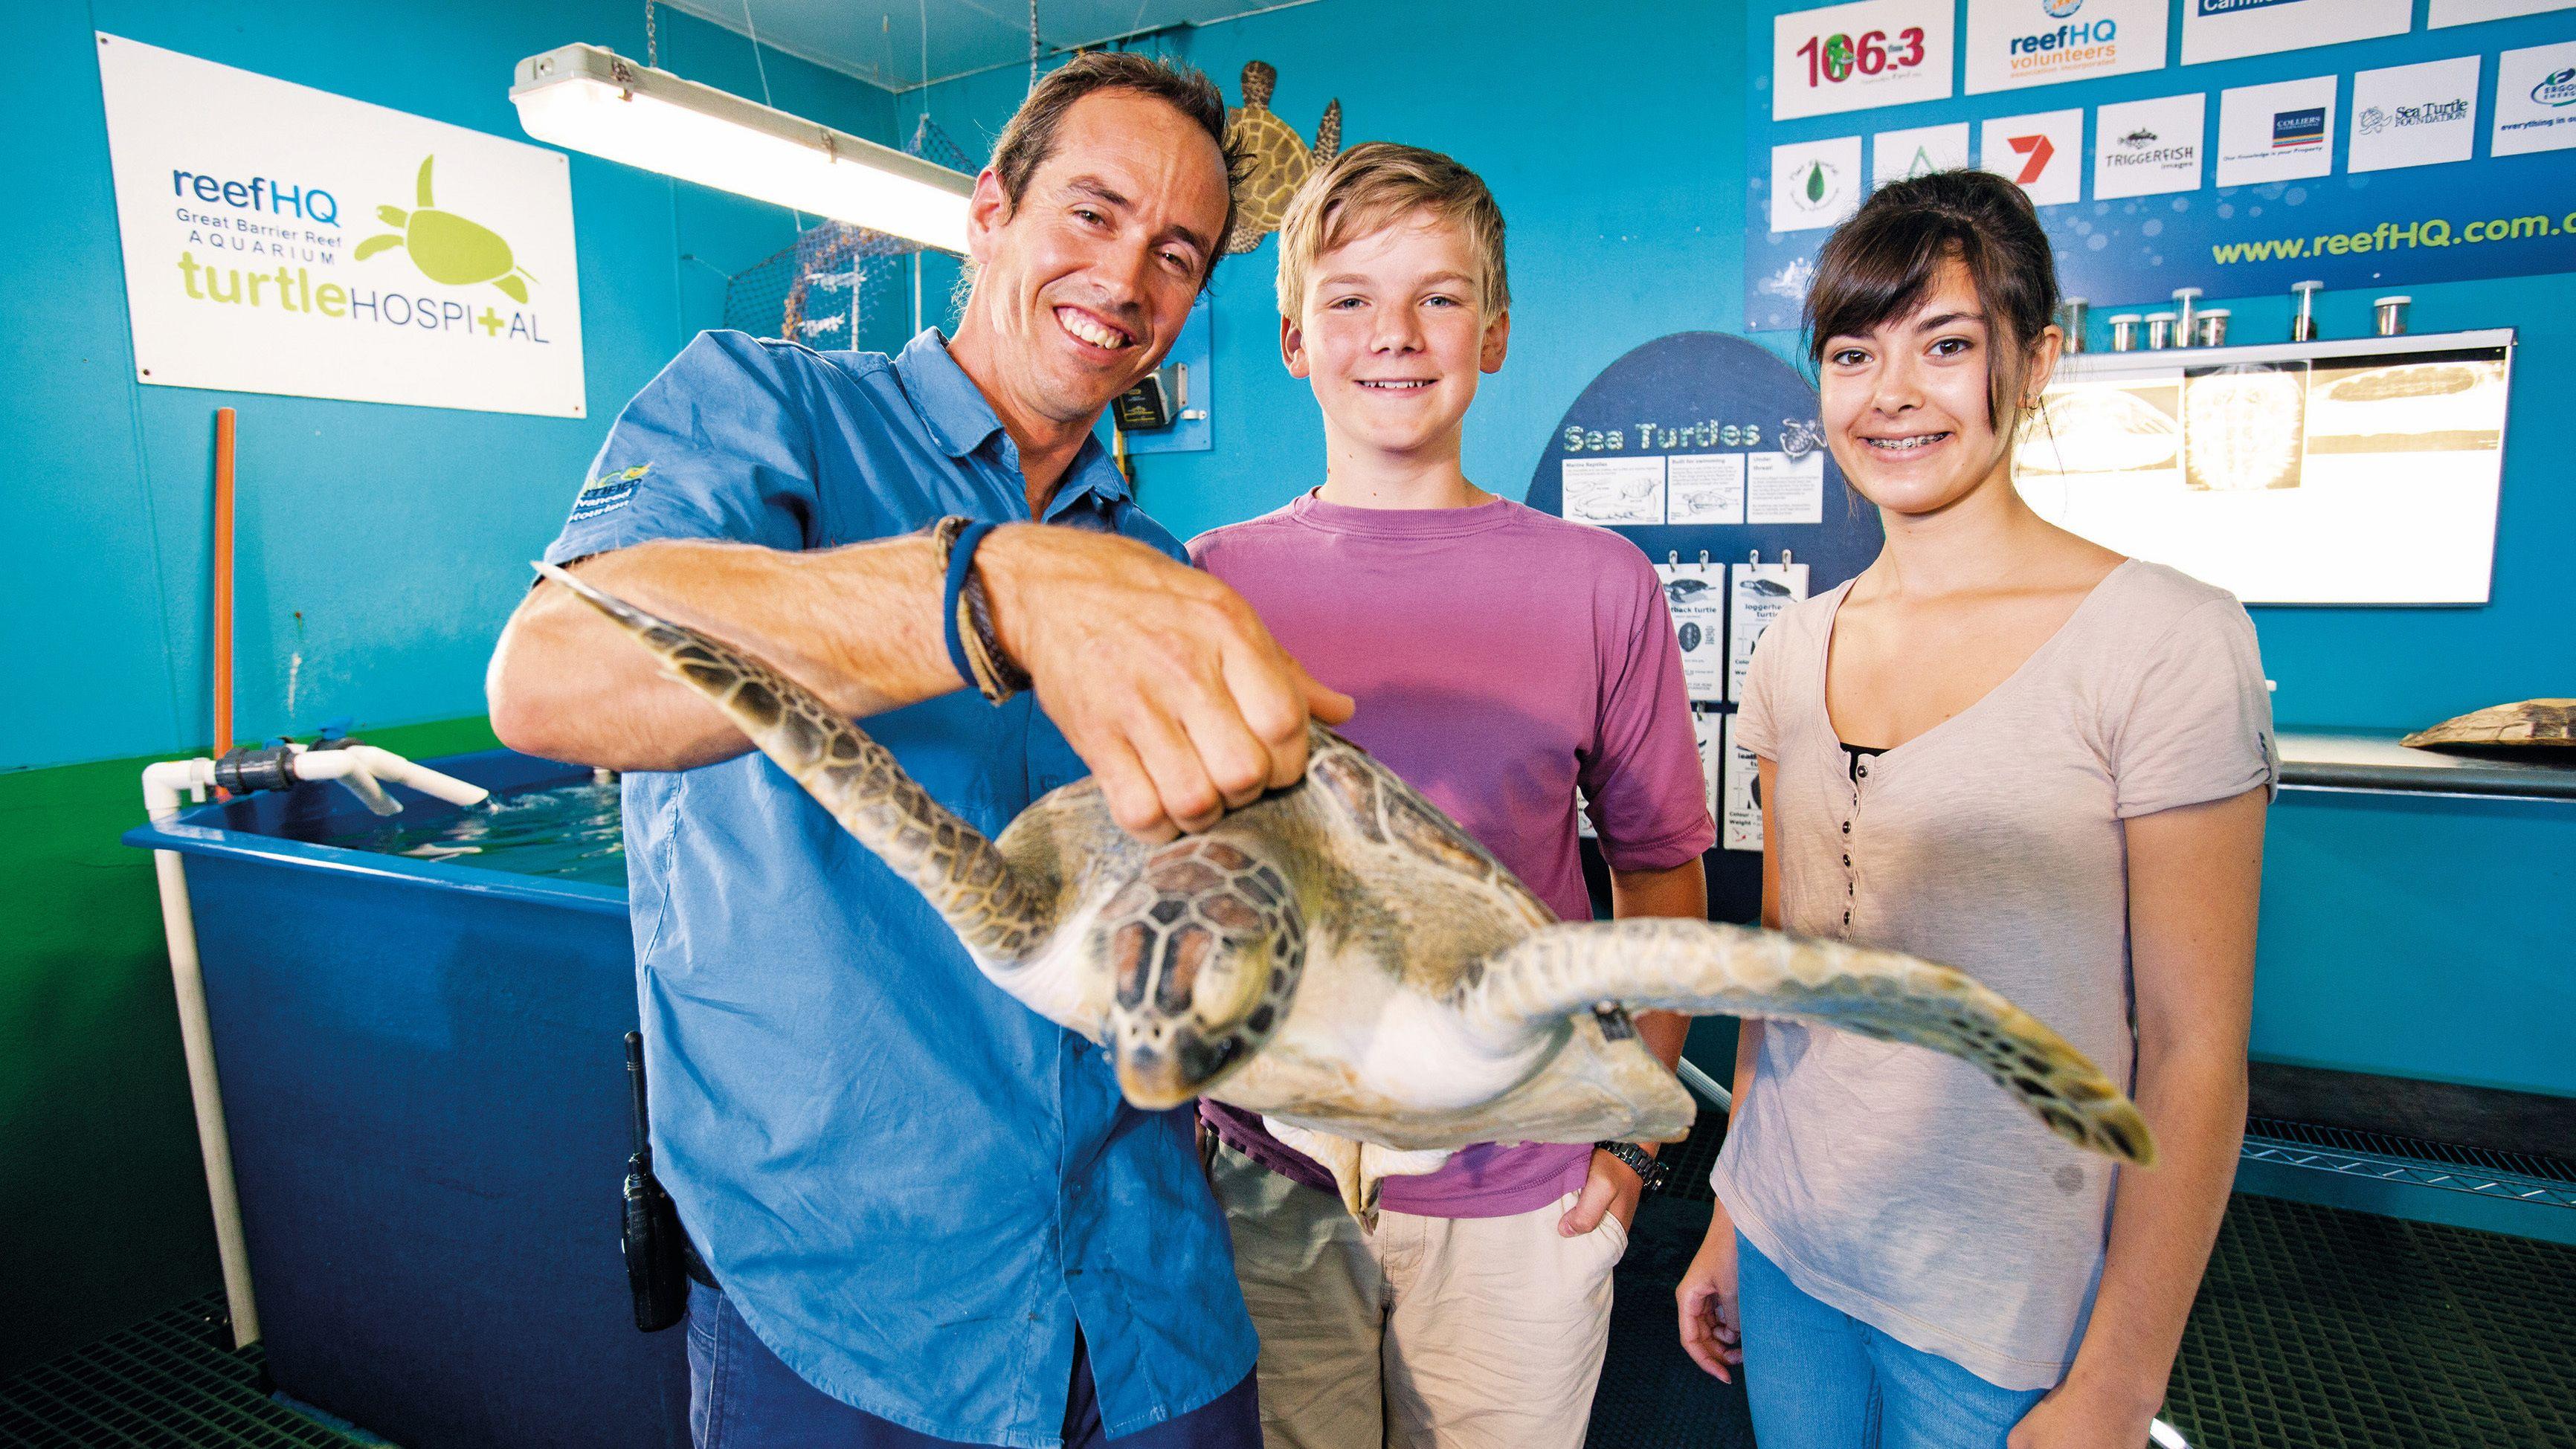 Reef HQ – The Great Barrier Reef Aquarium